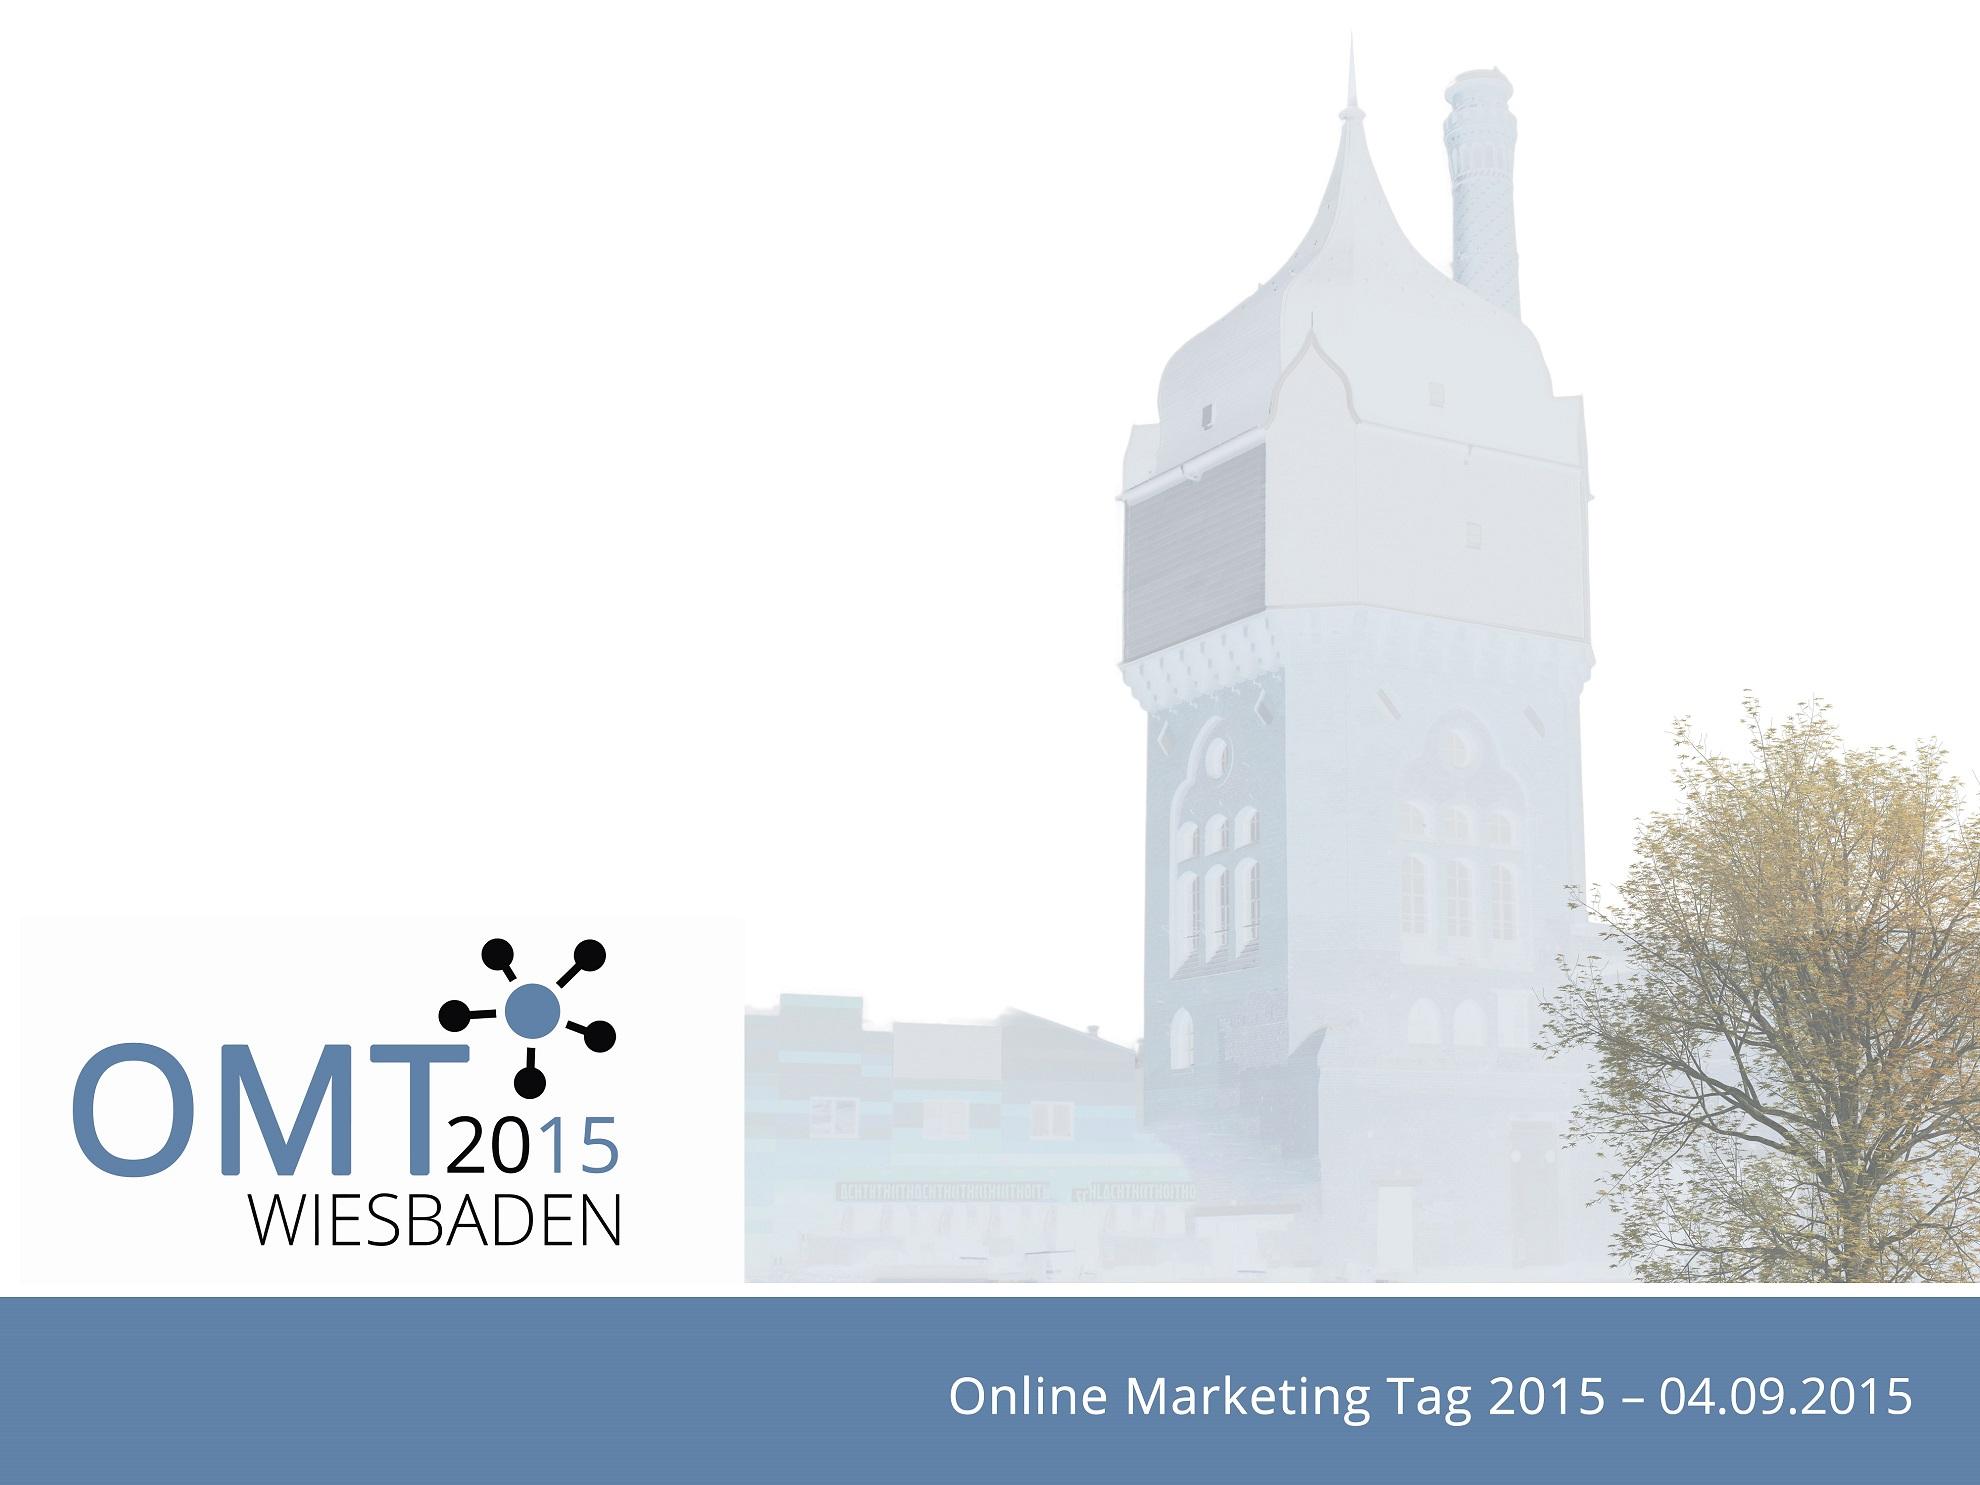 Online Marketing Tag 2015 in Wiesbaden